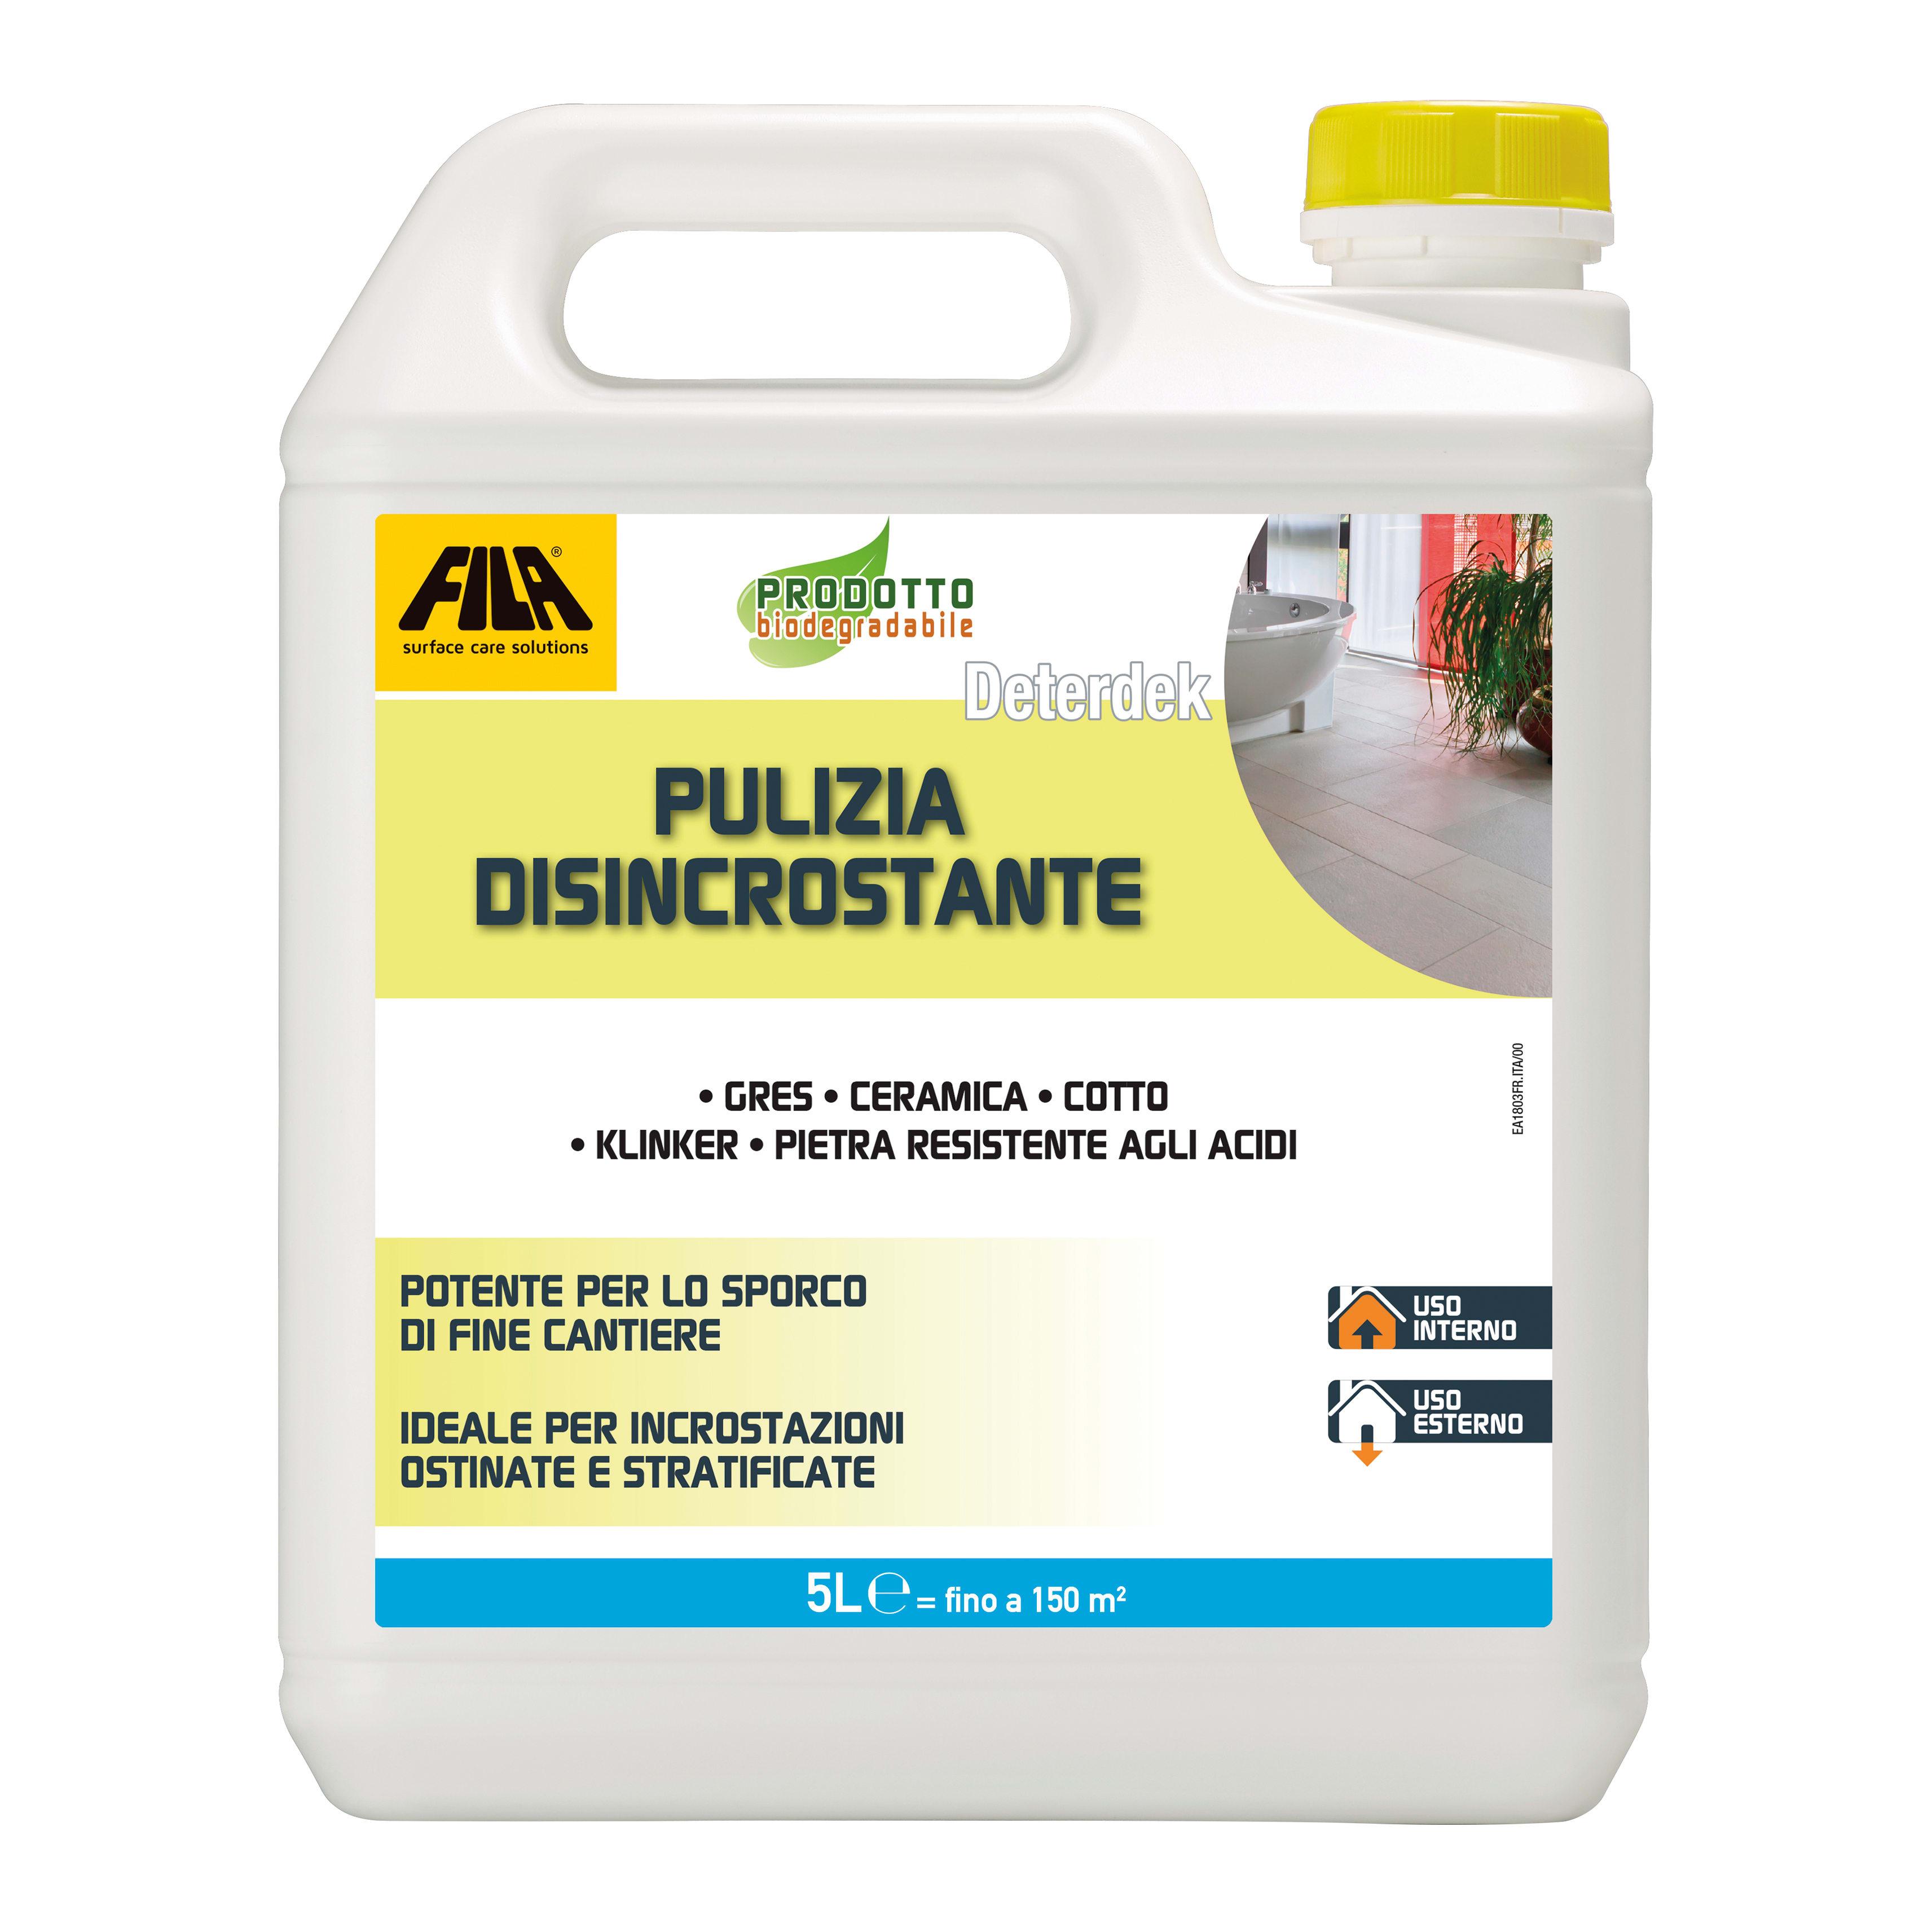 Detergente Per Cotto Esterno detergente pulizia disincrostante deterdek fila 5000 ml